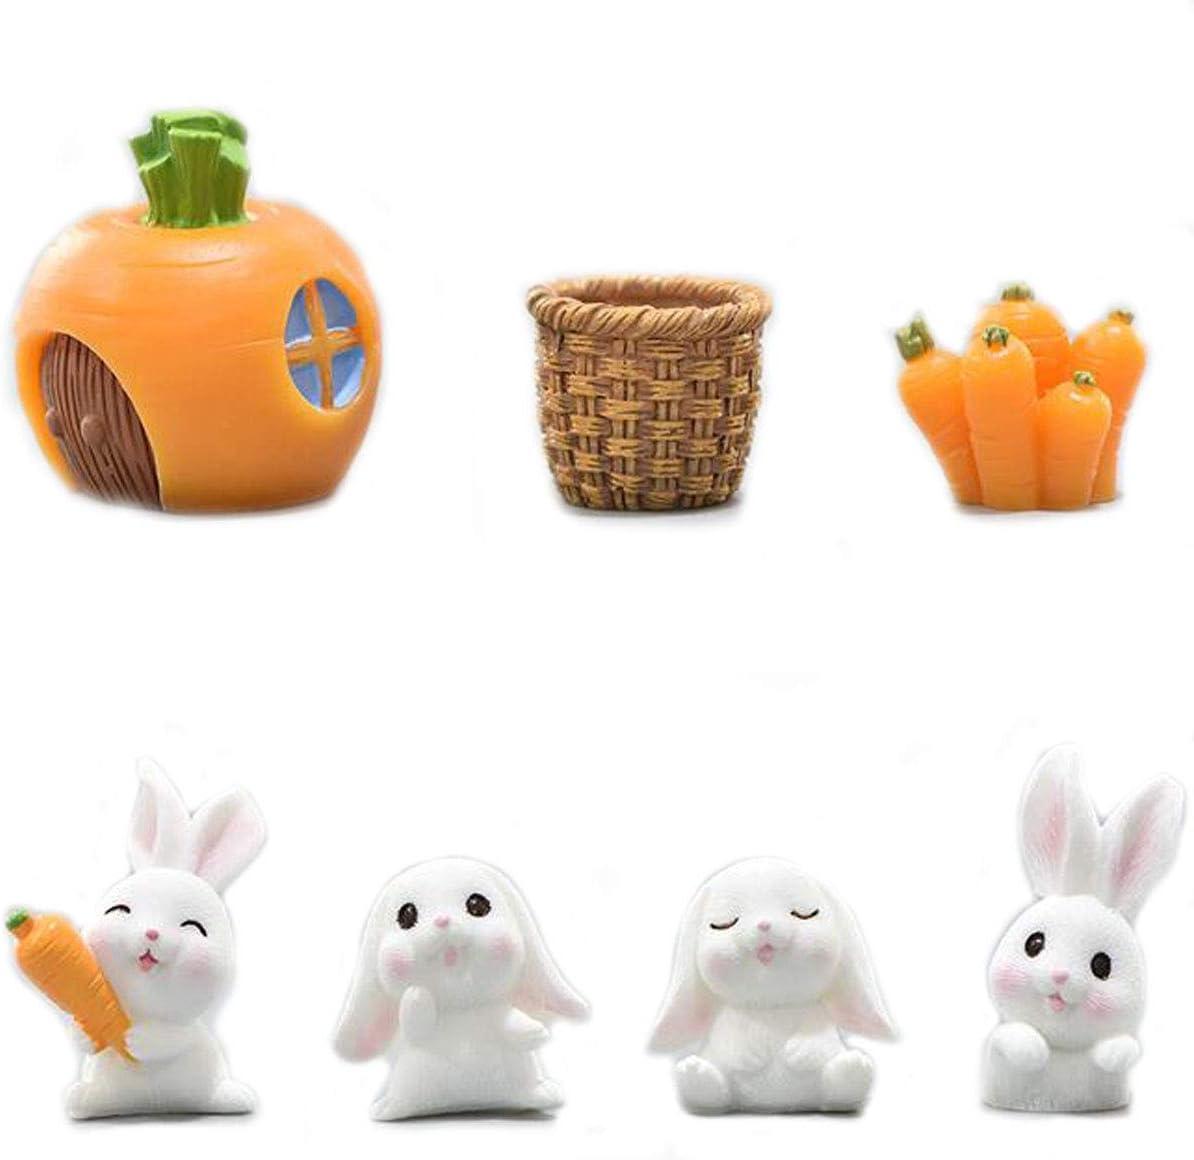 Ruzucoda Miniature Bunny Figurines Figure Animal Rabbit Toys Fairy Garden Party Decorations White